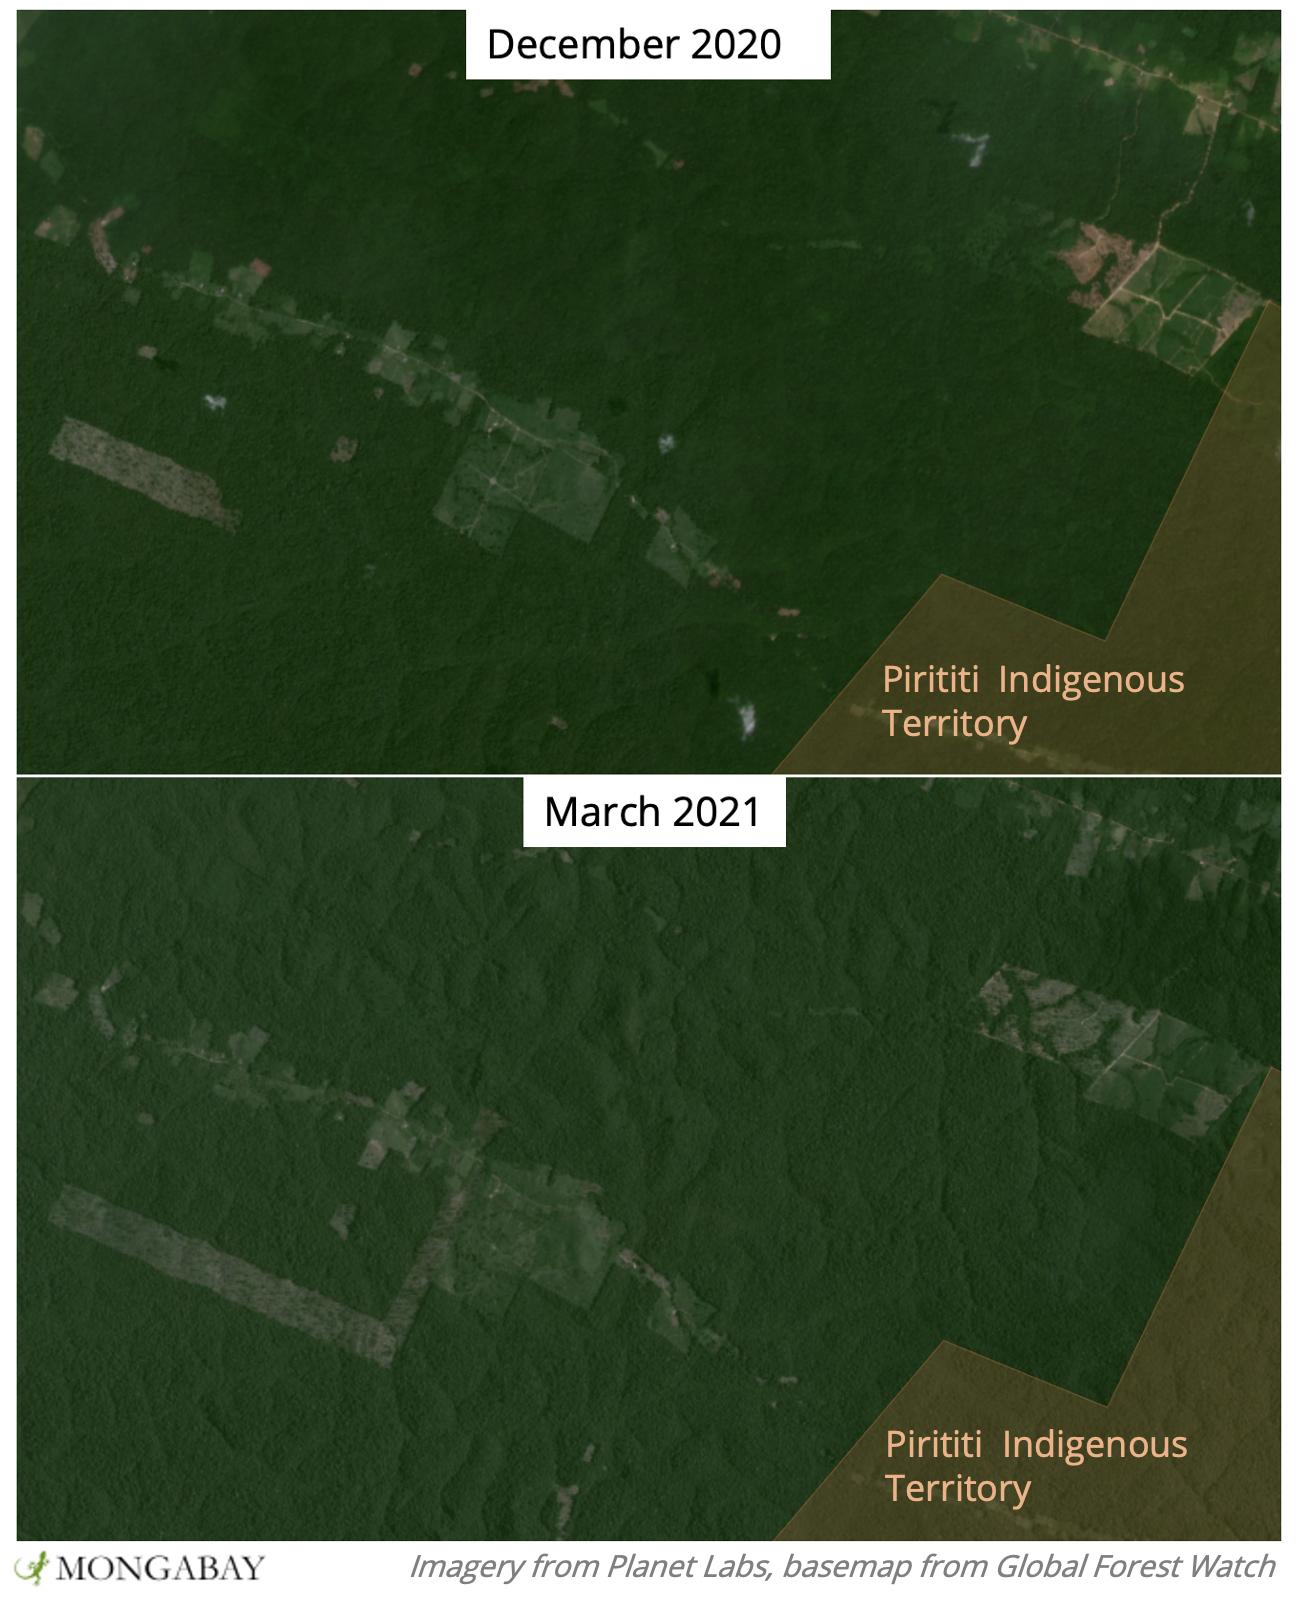 Satellite images show recent deforestation near Piriti Indigenous Territory.